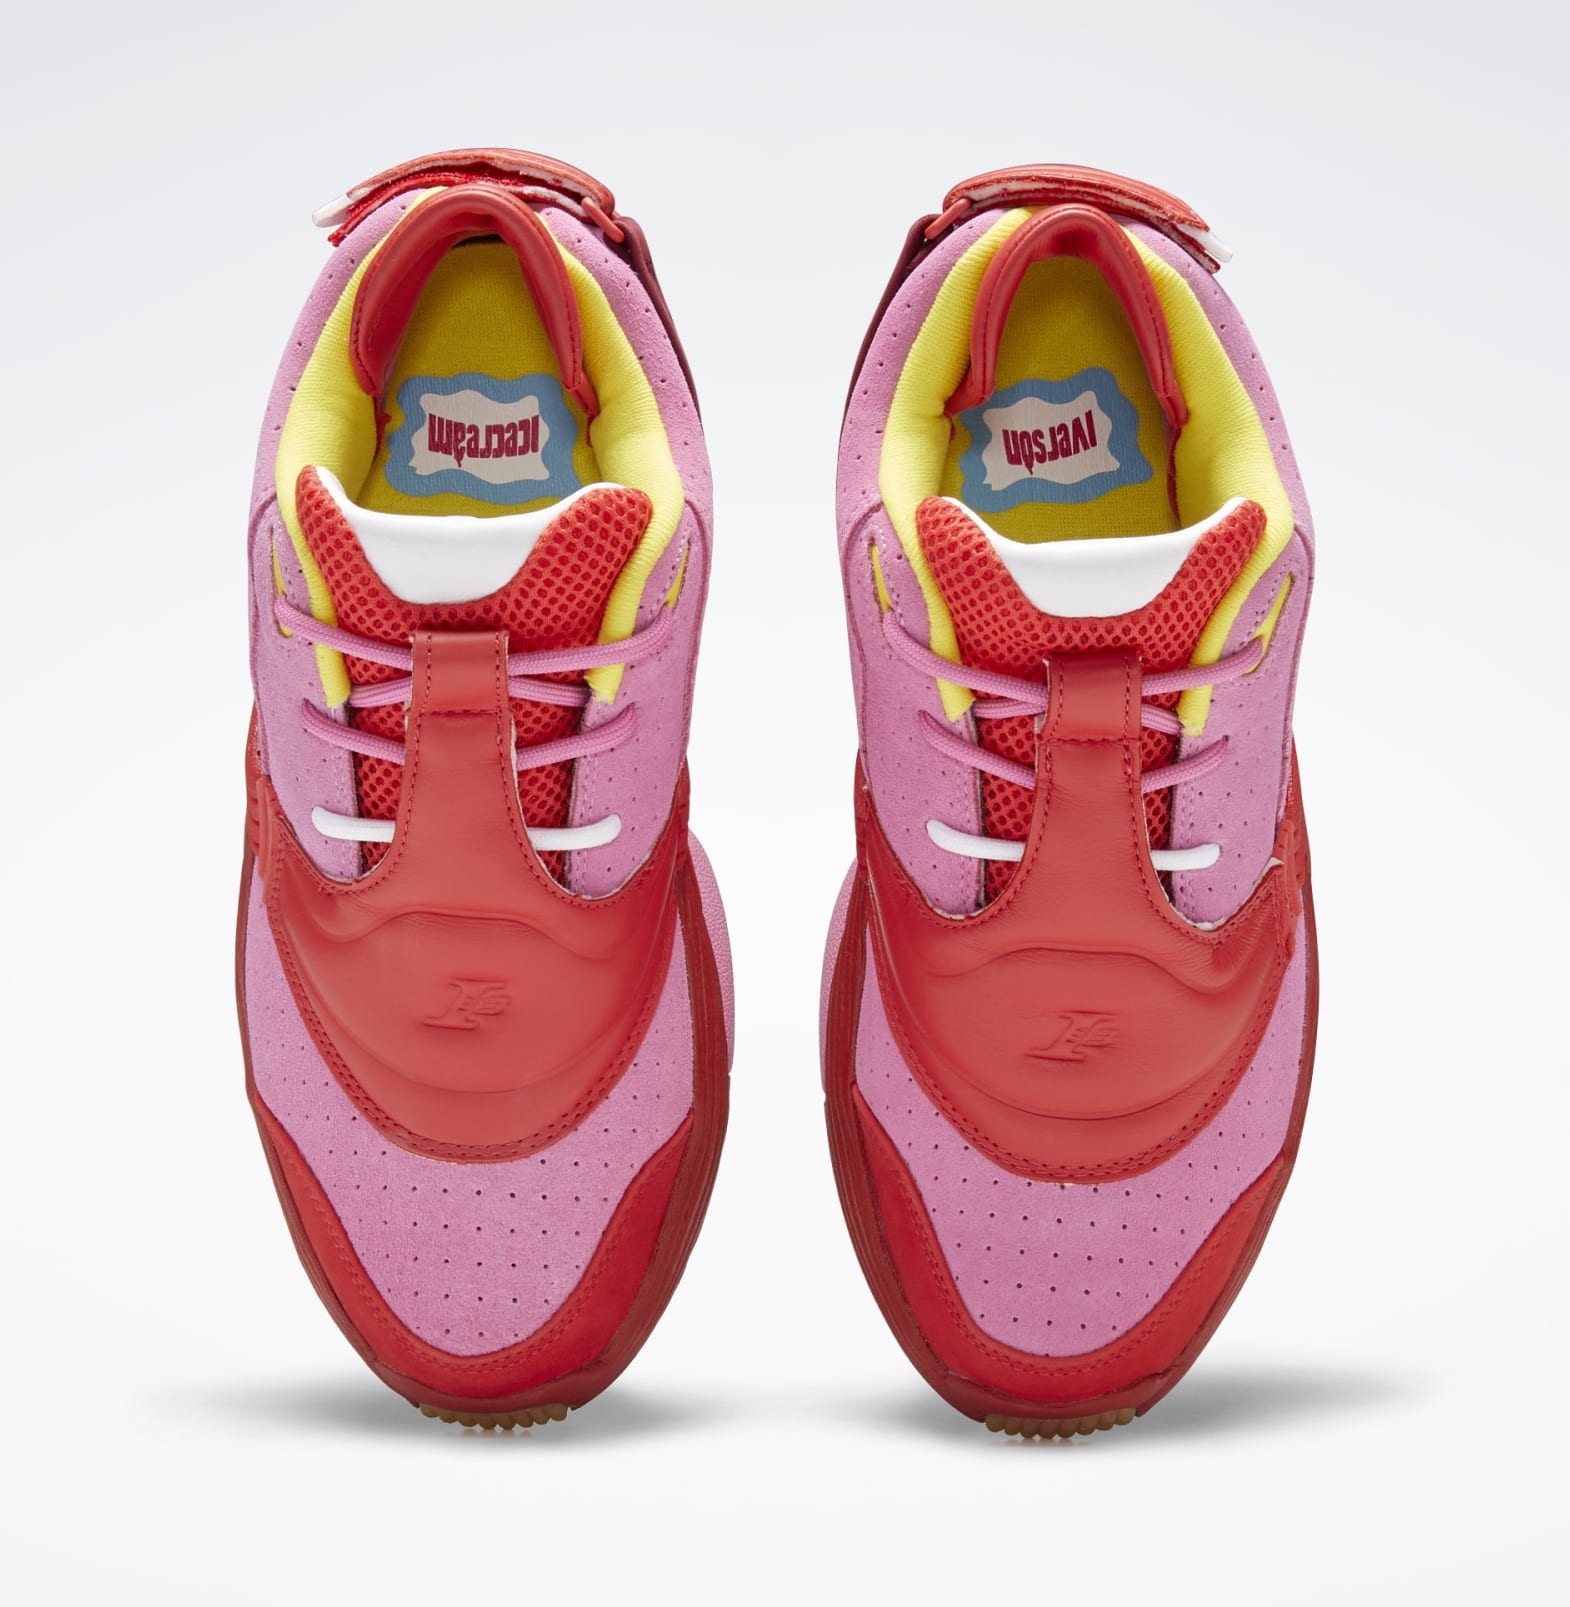 bbc-ice-cream-reebok-answer-v-cherry-tomato-posh-pink-stinger-yellow-fw7505-top